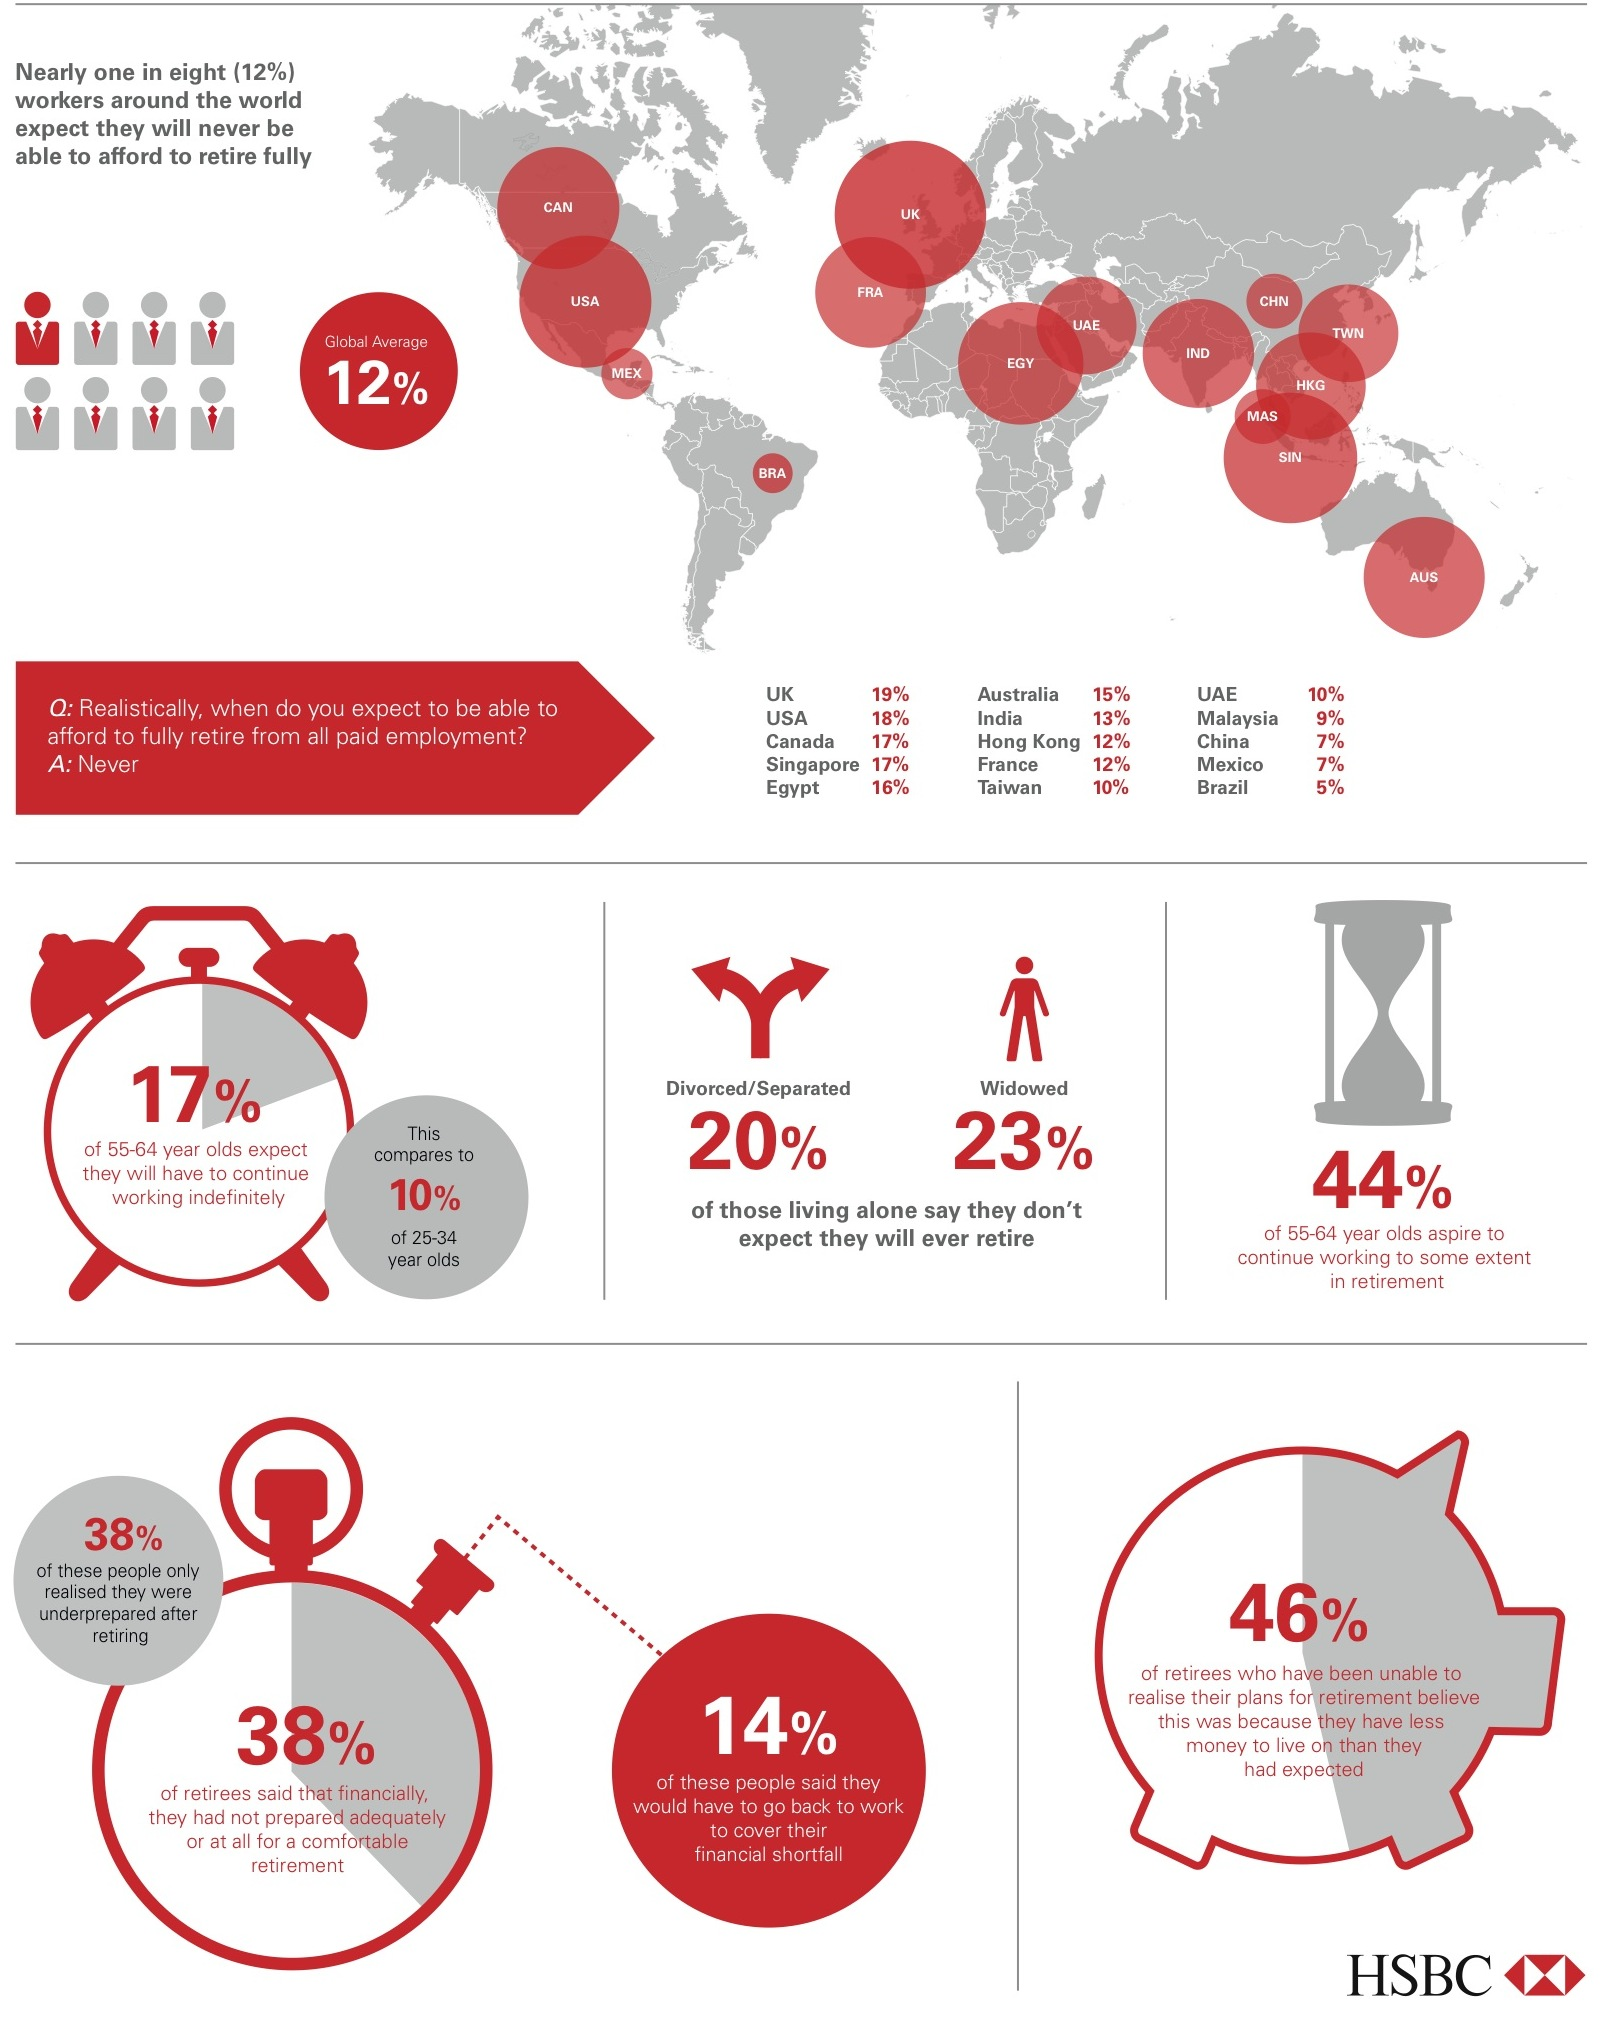 HSBC-FutureofRetirementReport-Infographic-2013